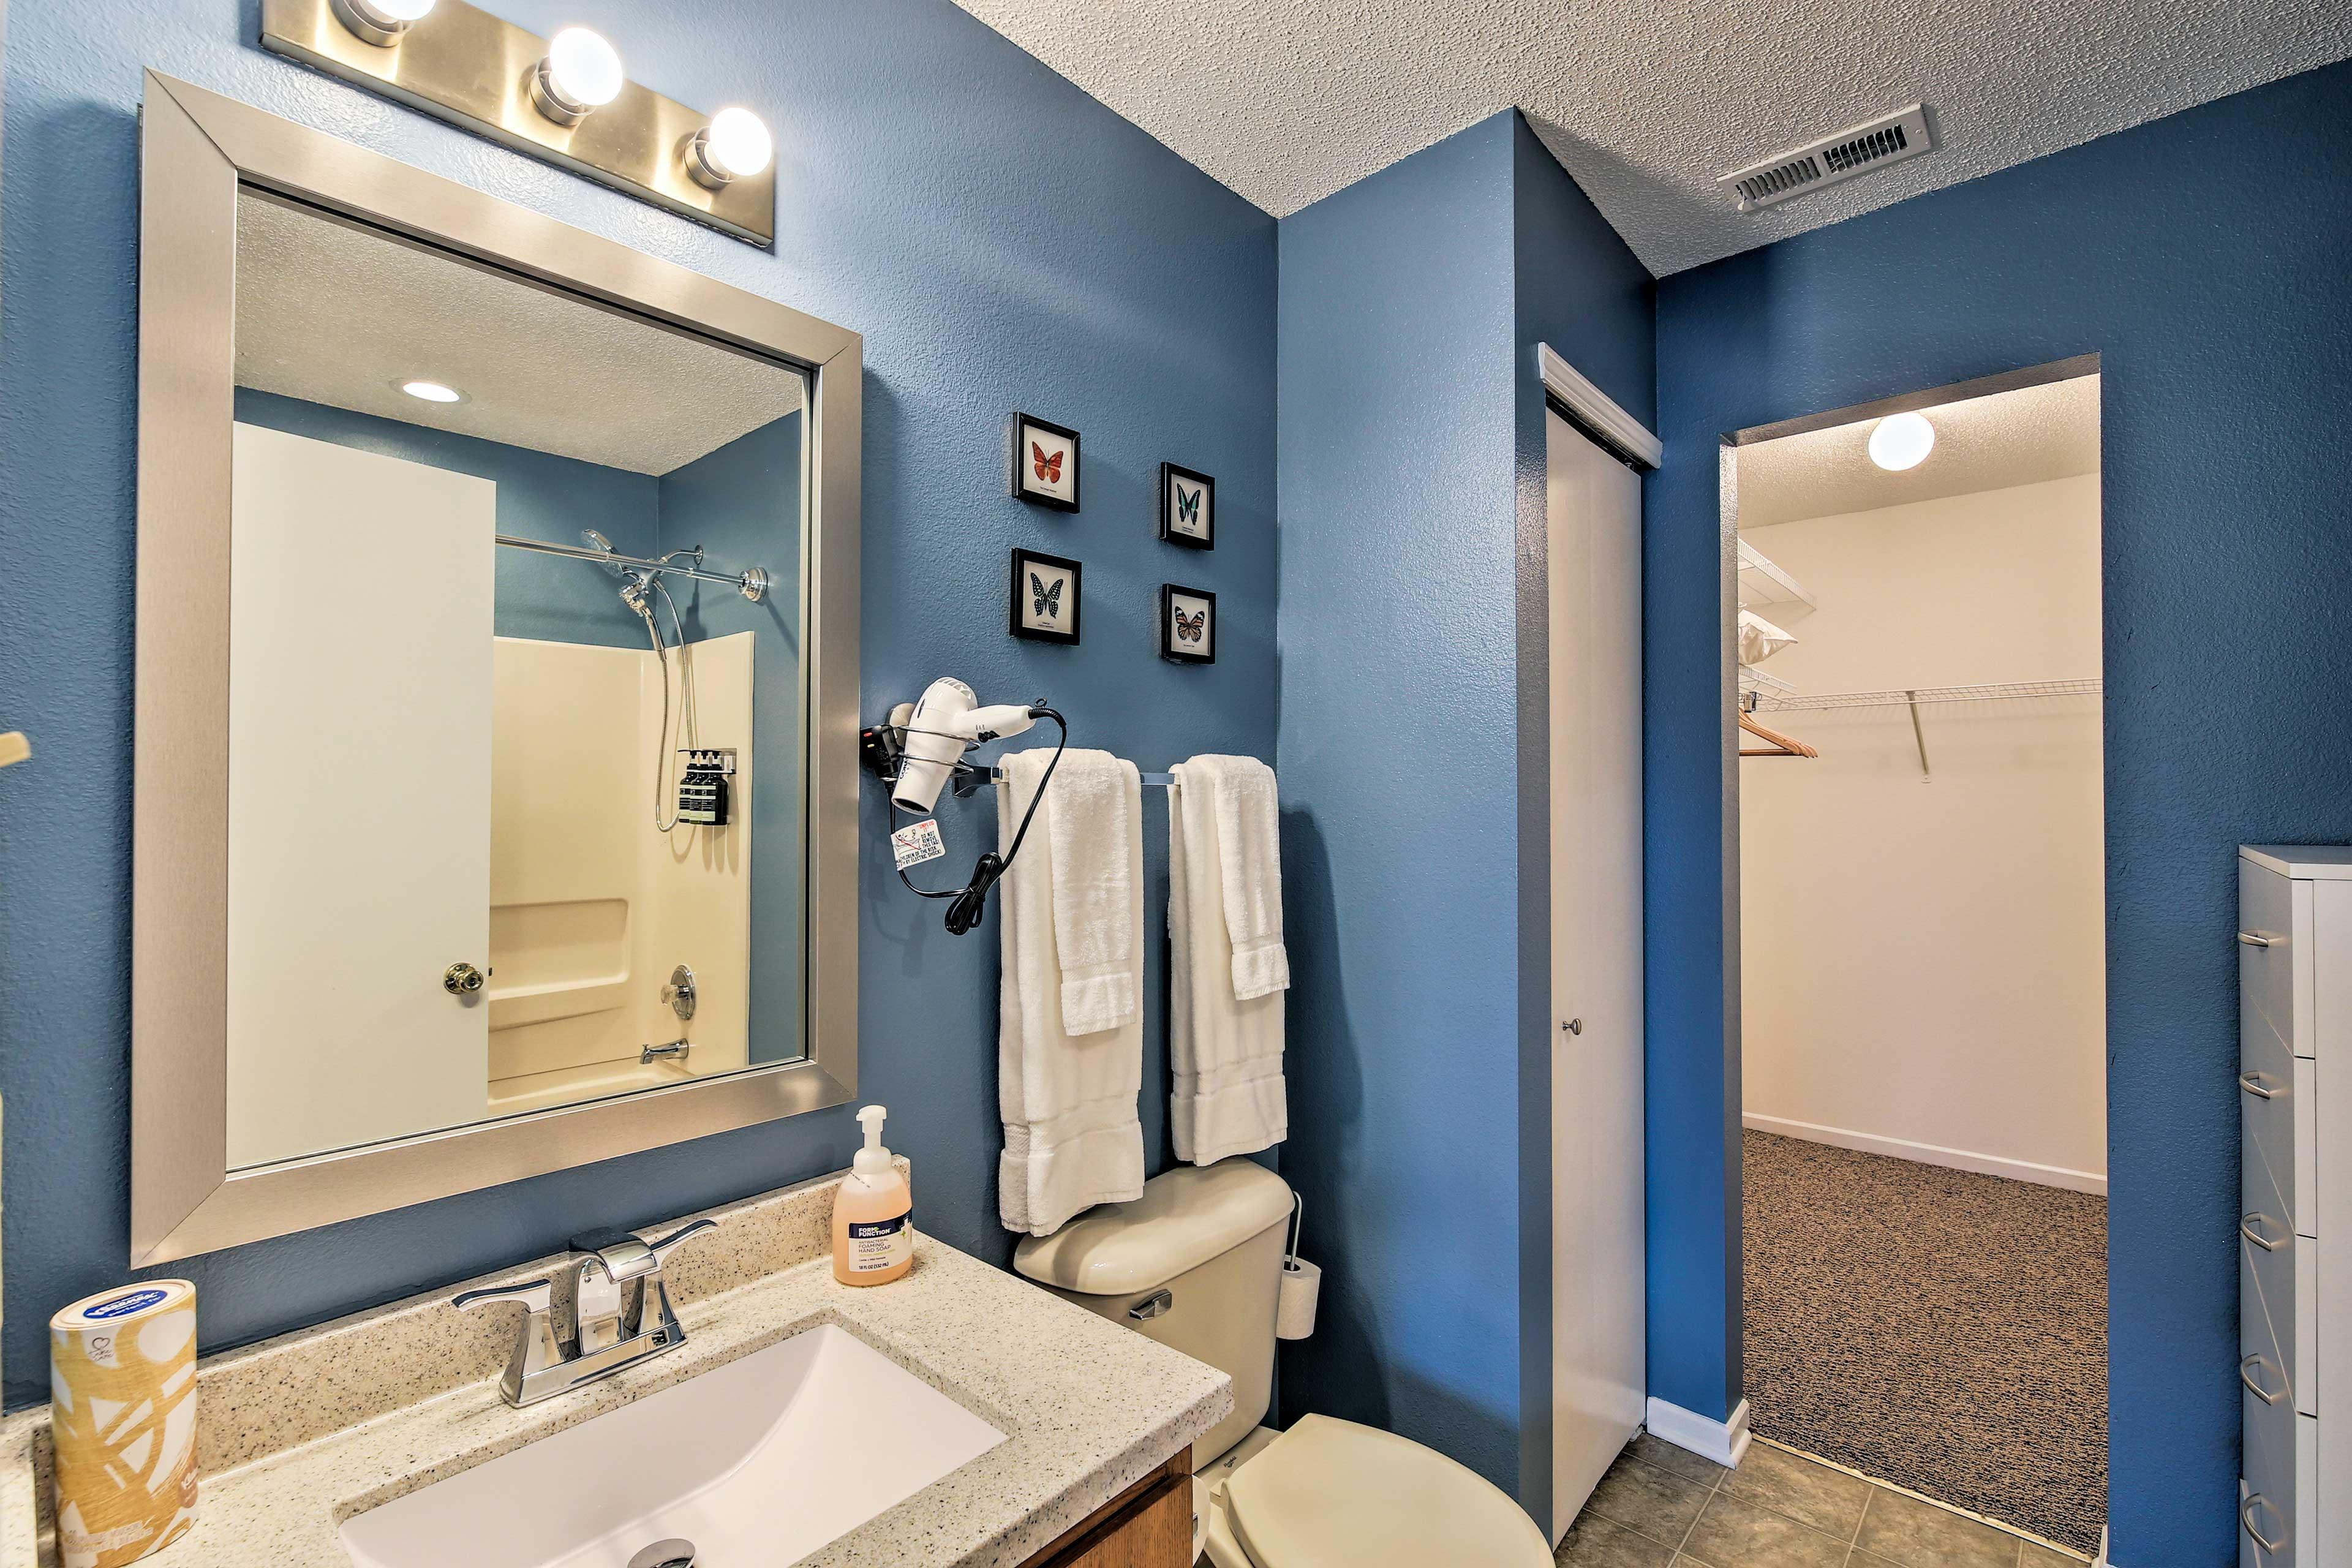 Enjoy the convenience of an en-suite bathroom and walk-in closet.